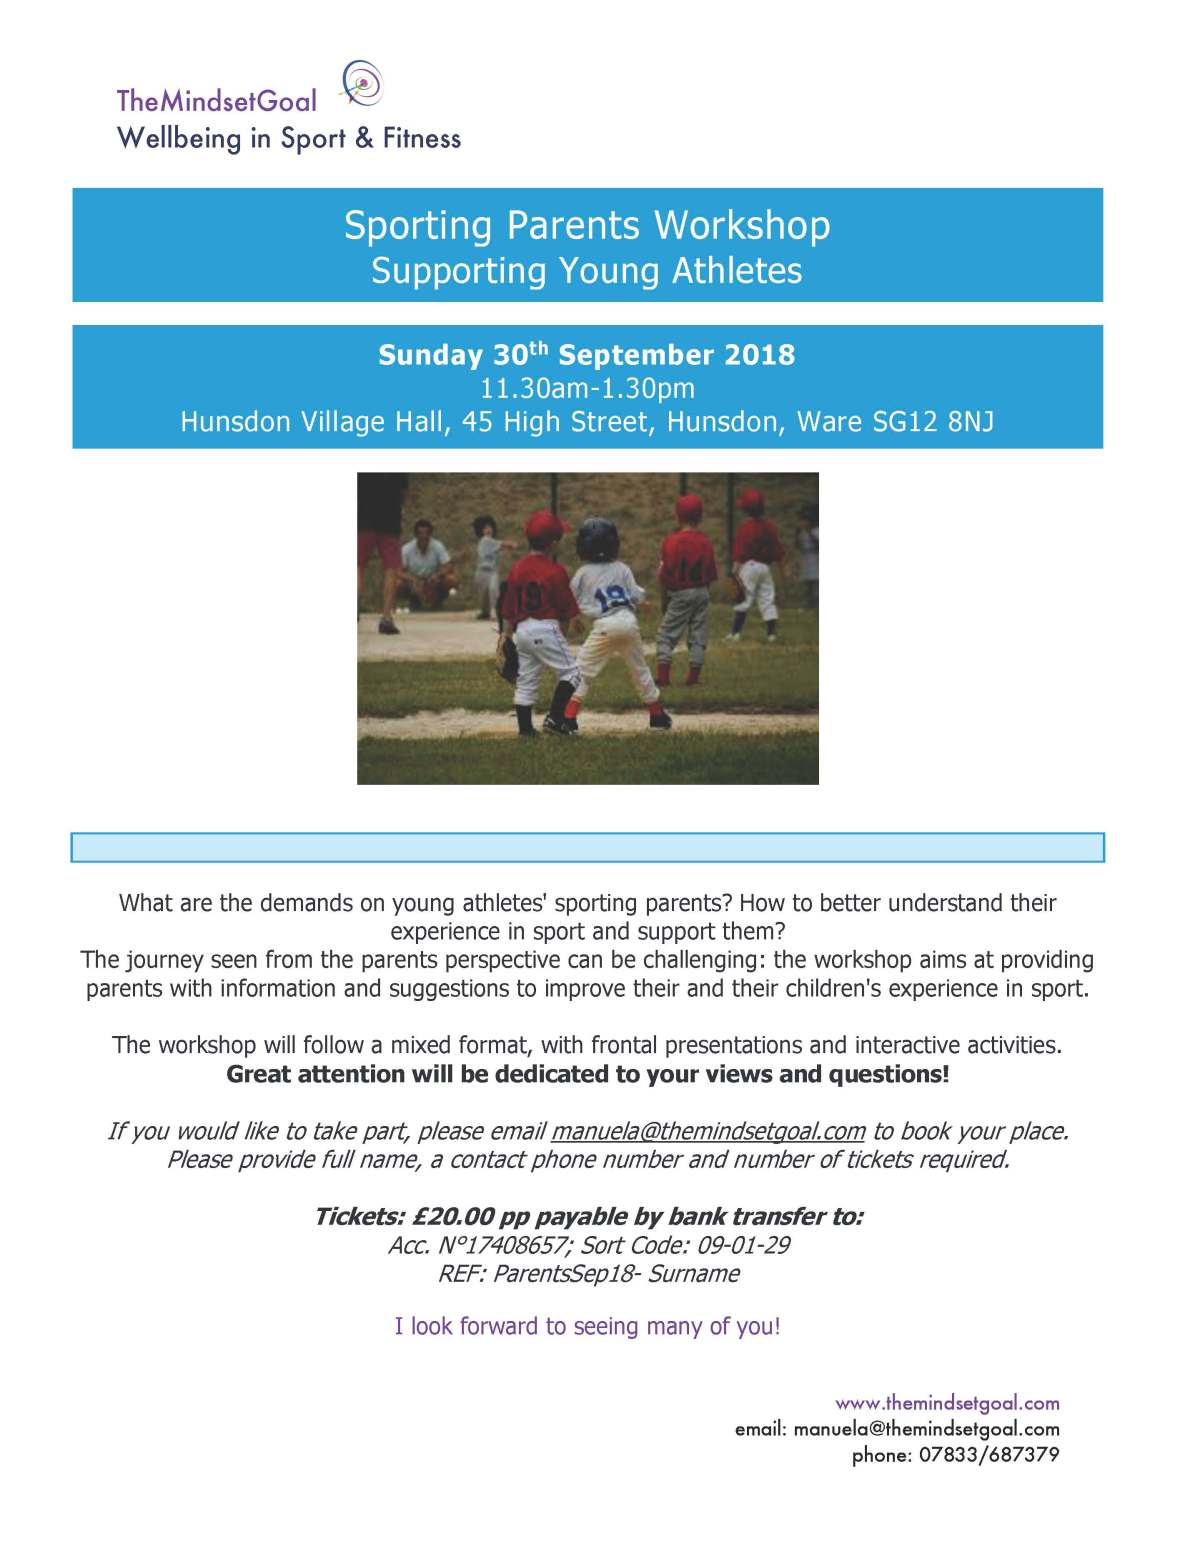 Sporting Parents Workshop 30-9-18